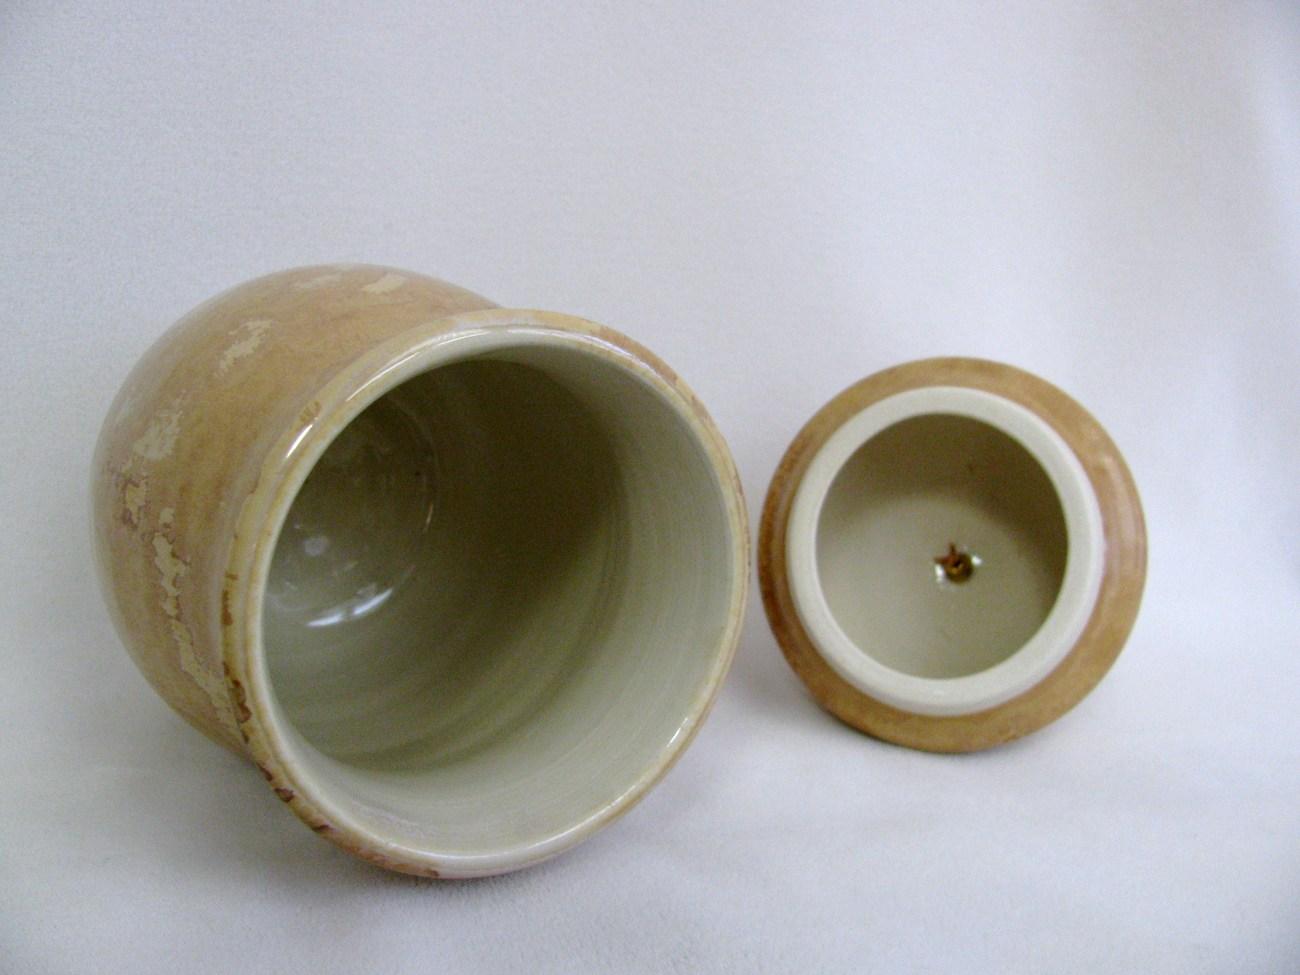 Lidded Porcelain Vessel Crystalline Glaze RKC041